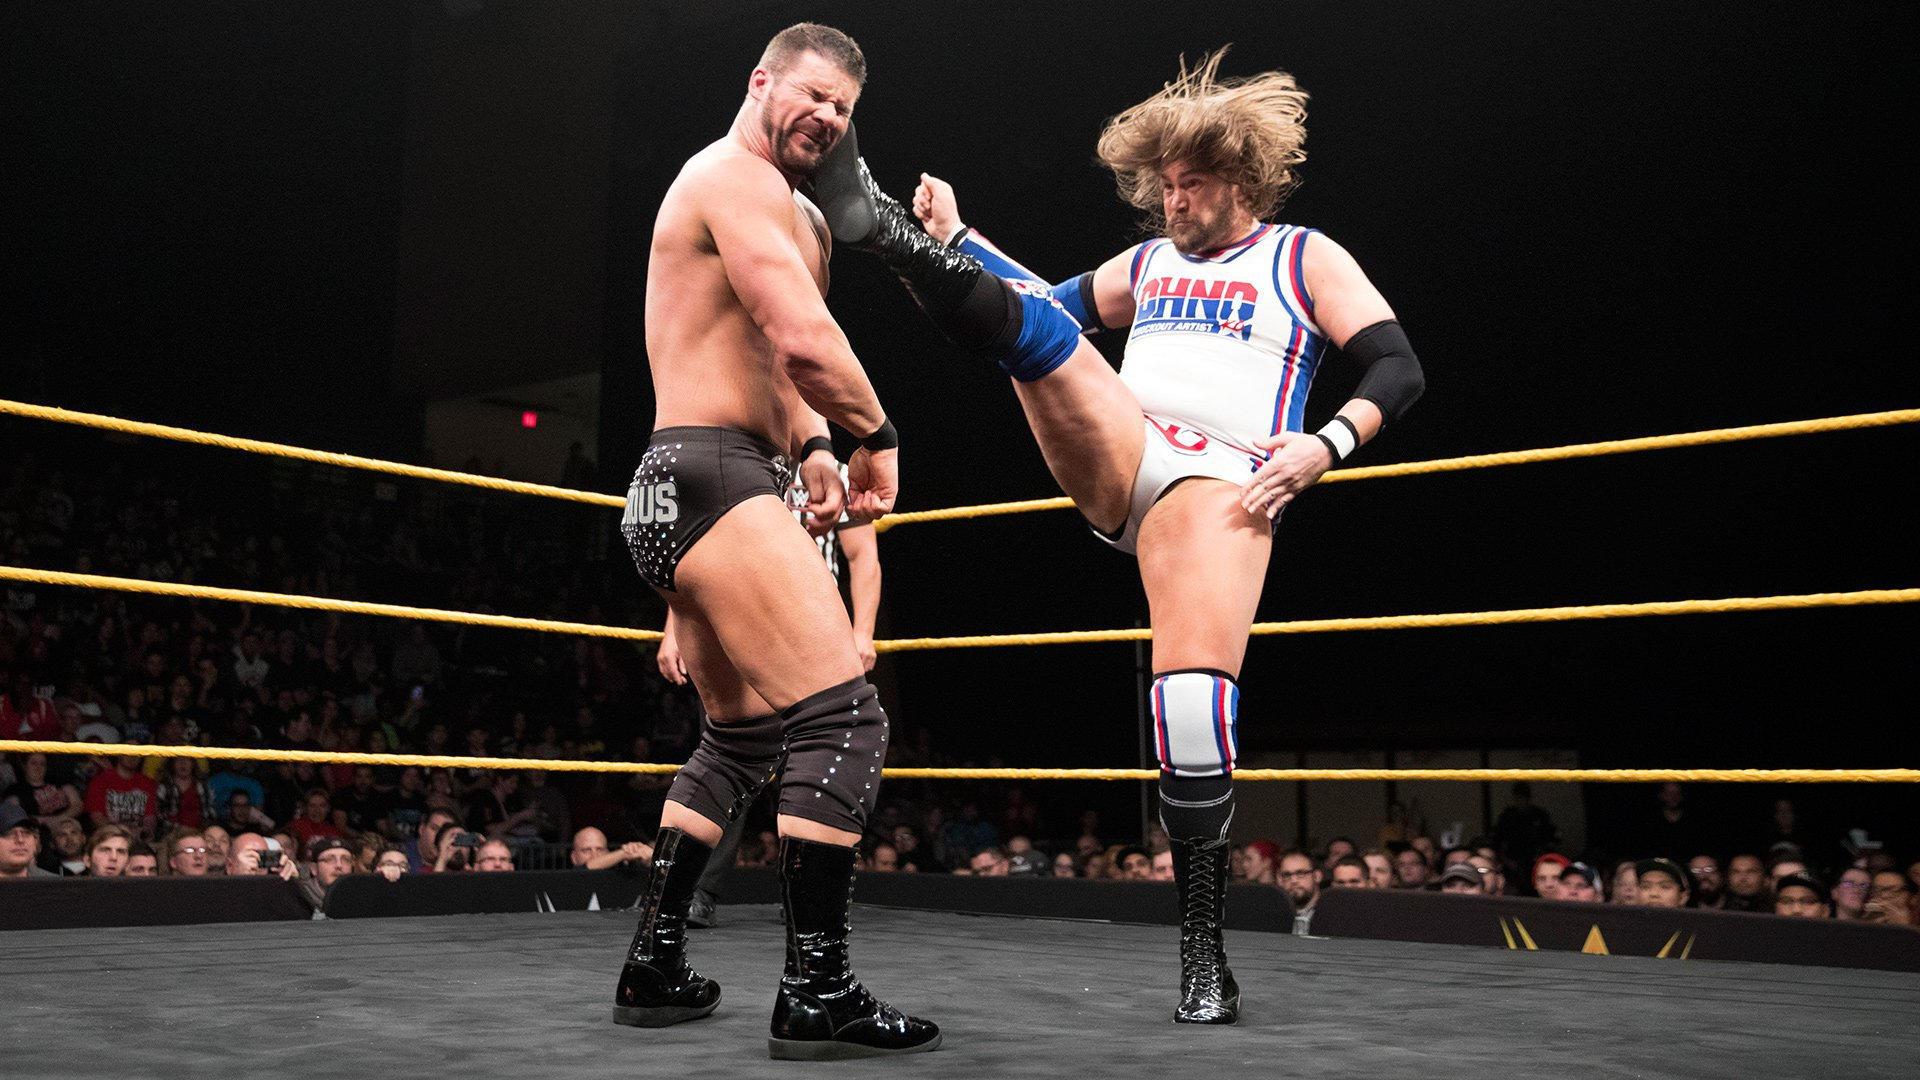 Resultats WWE NXT 15 mars 2017